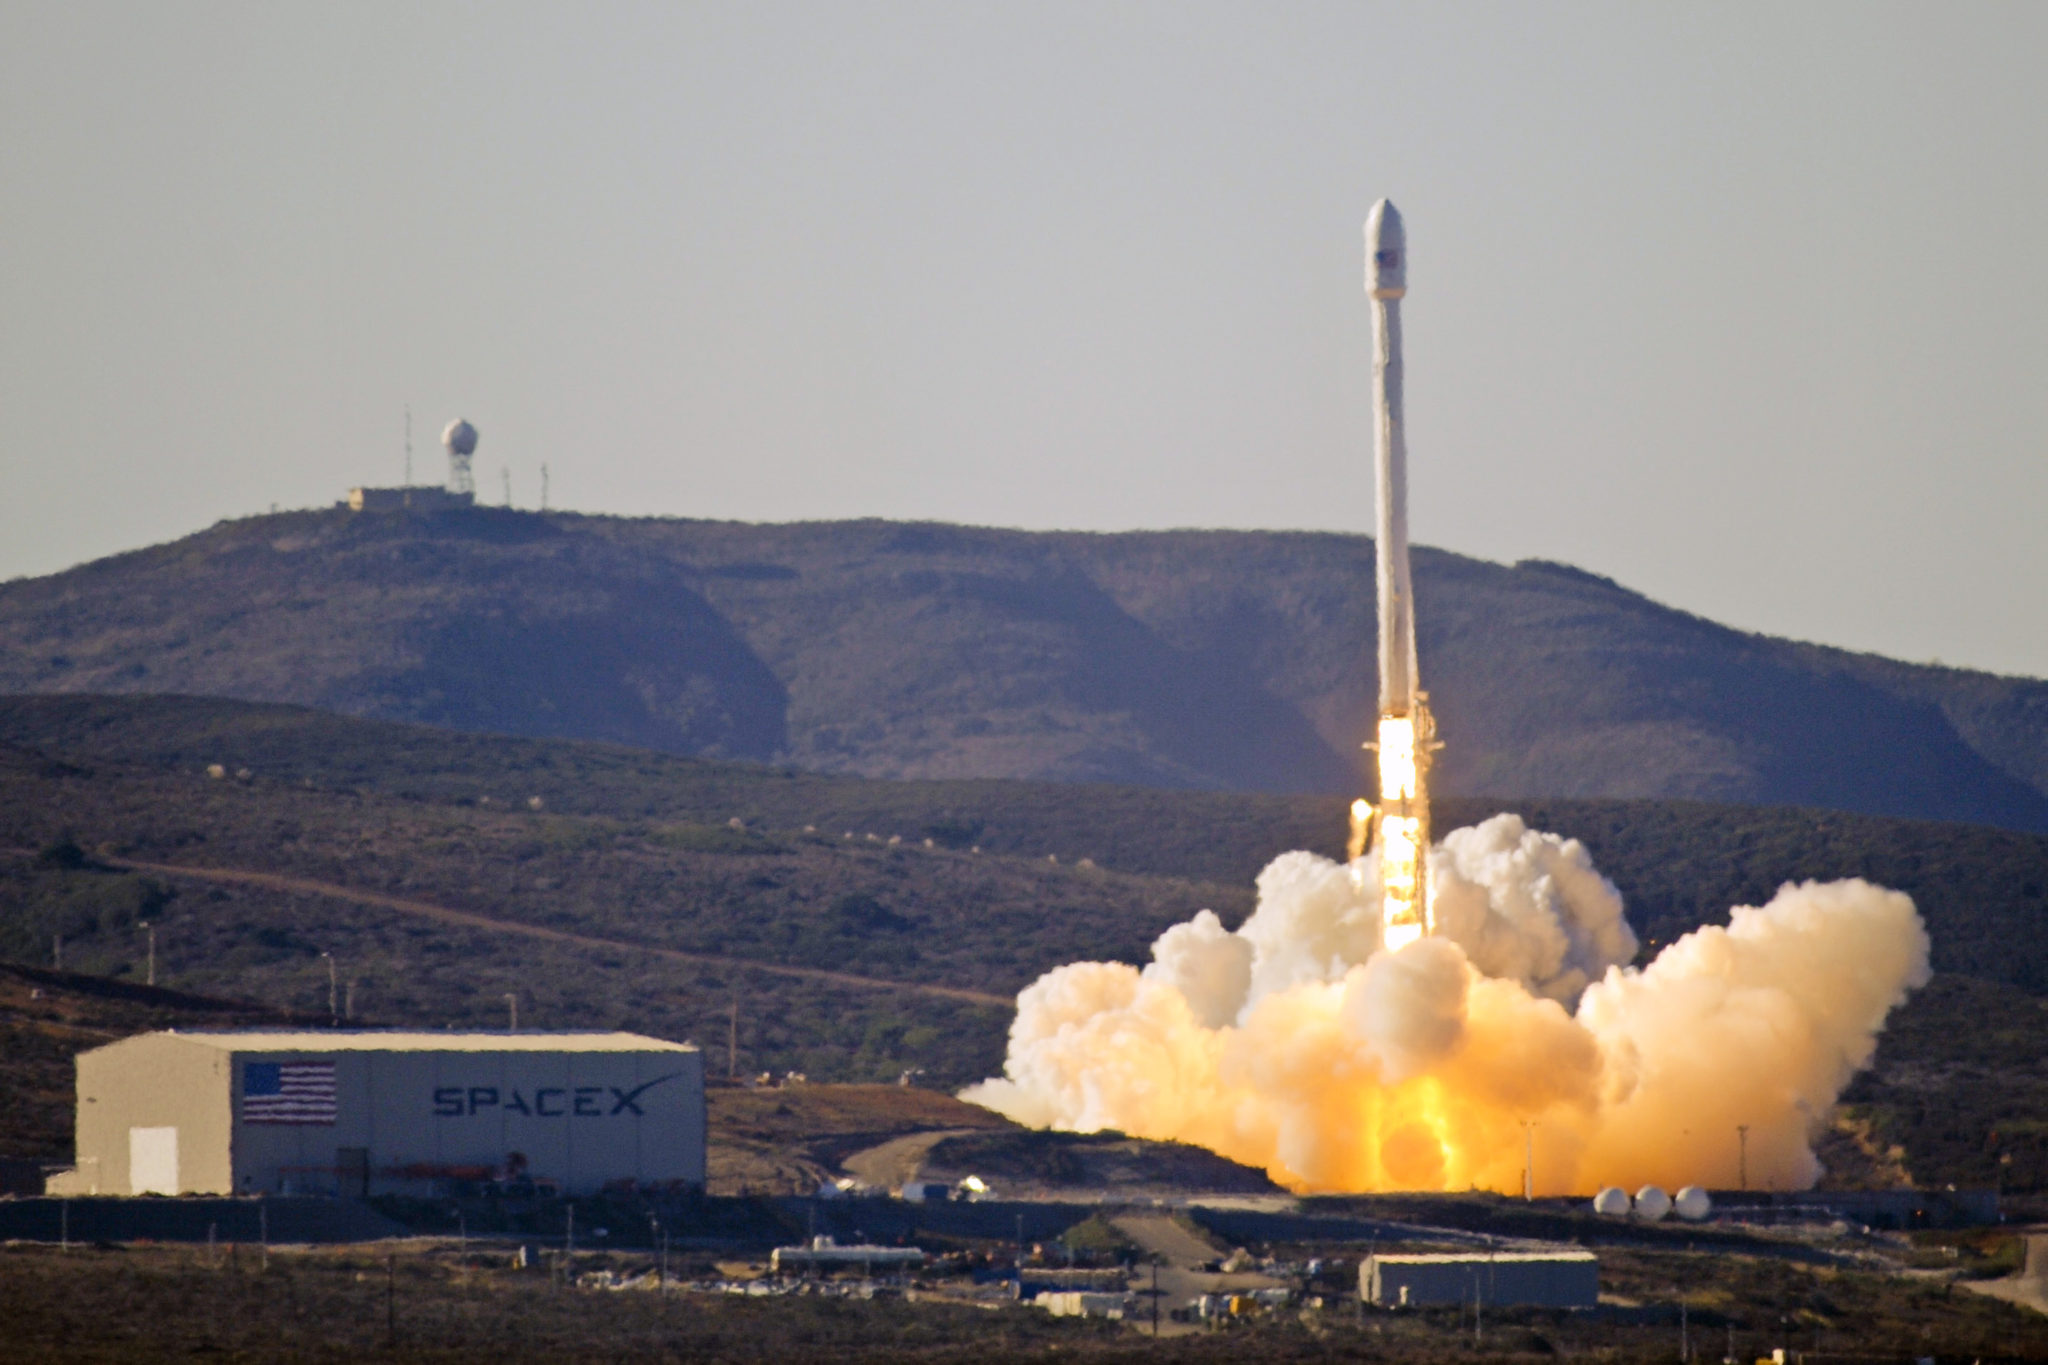 SpaceX Air Force EELV